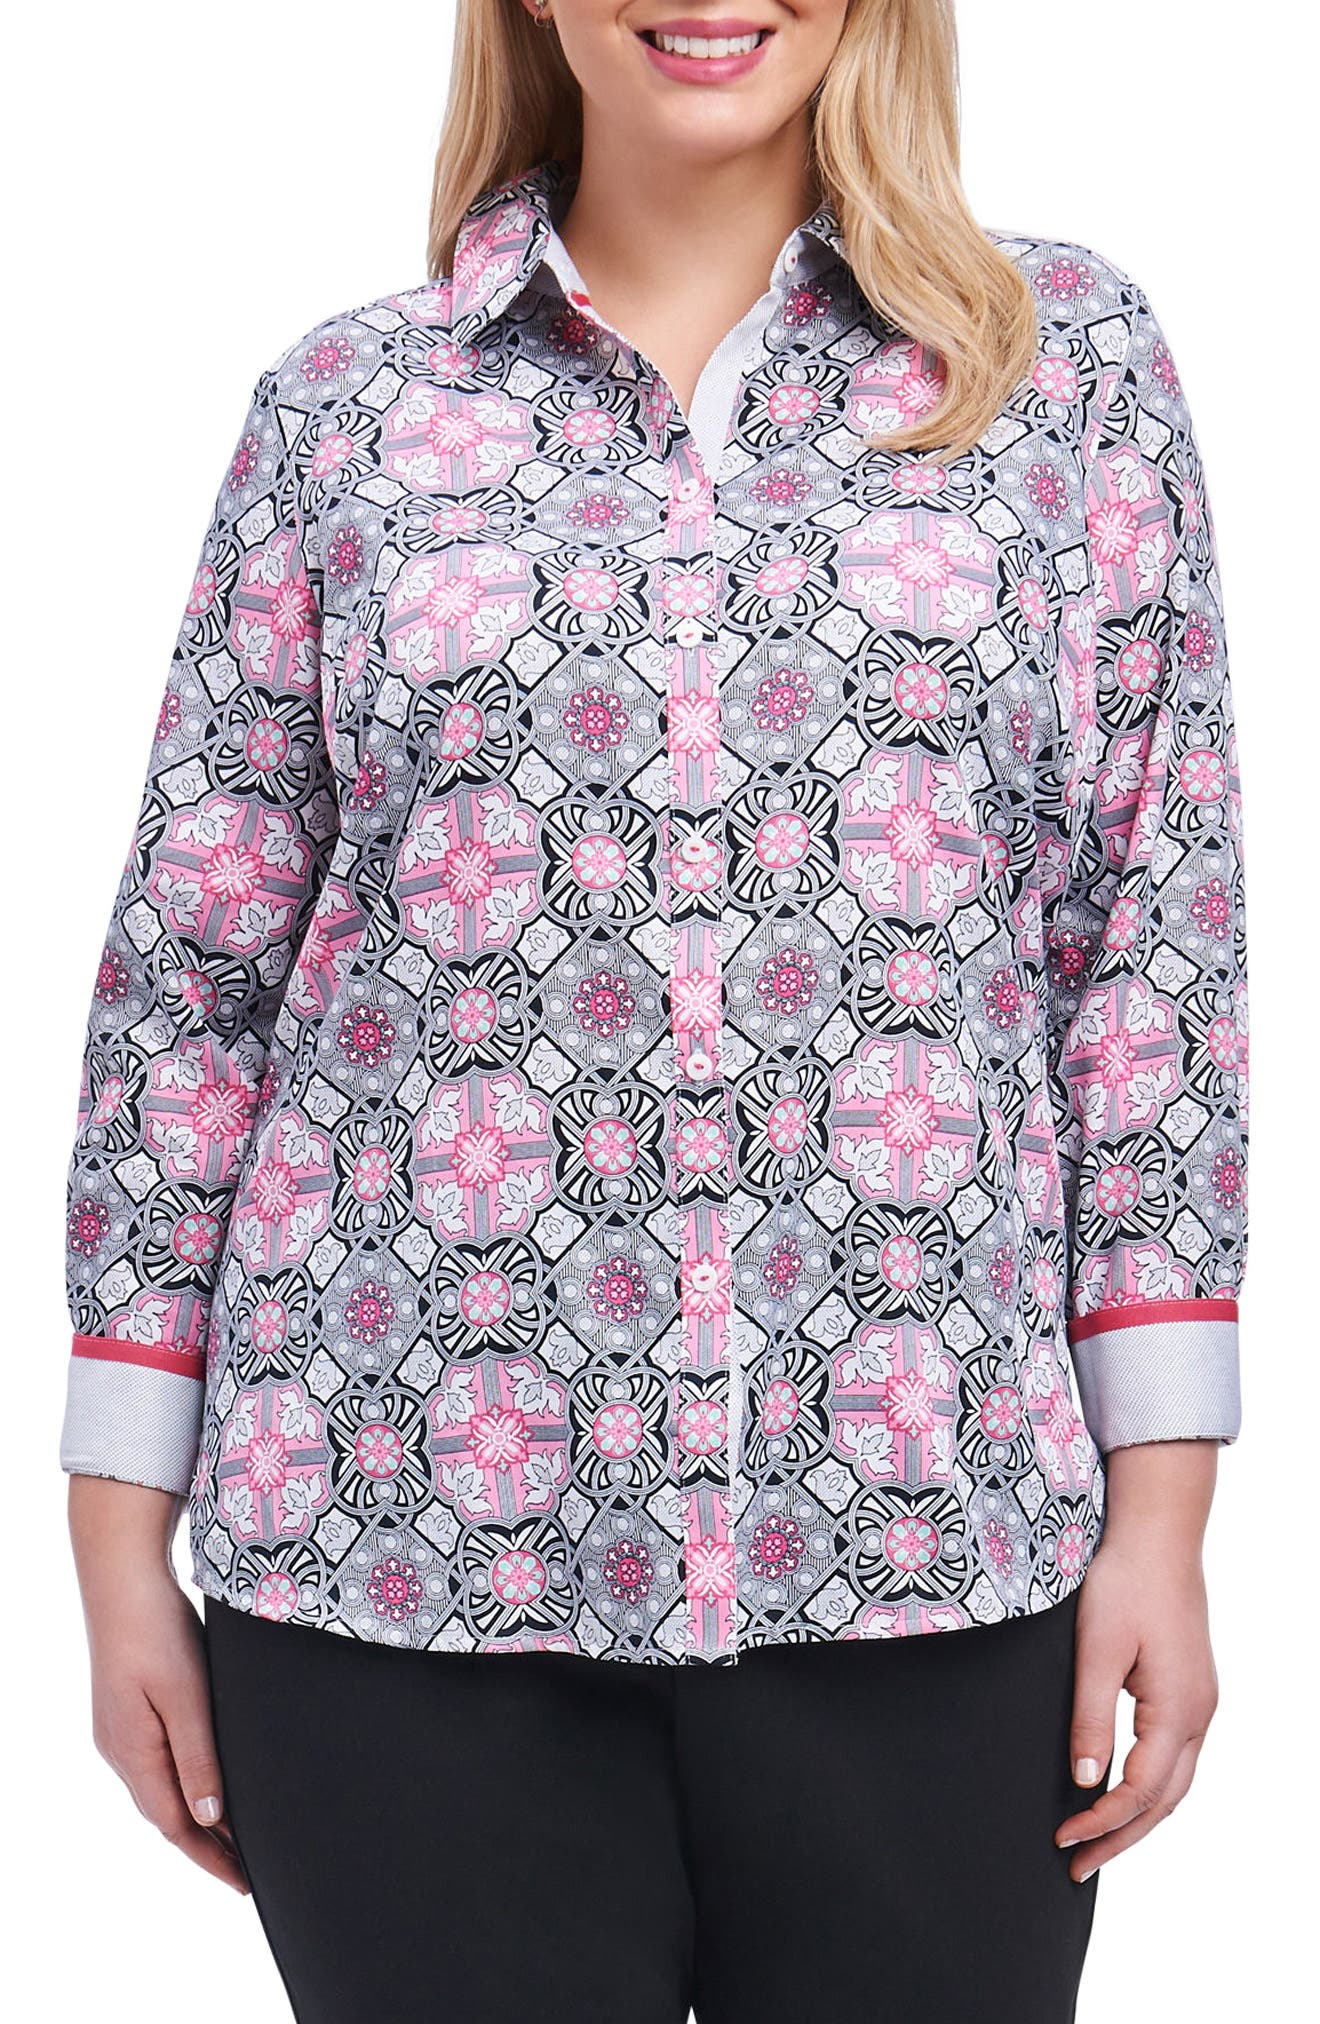 Ava Mosaic Tile Shirt,                         Main,                         color, Multi